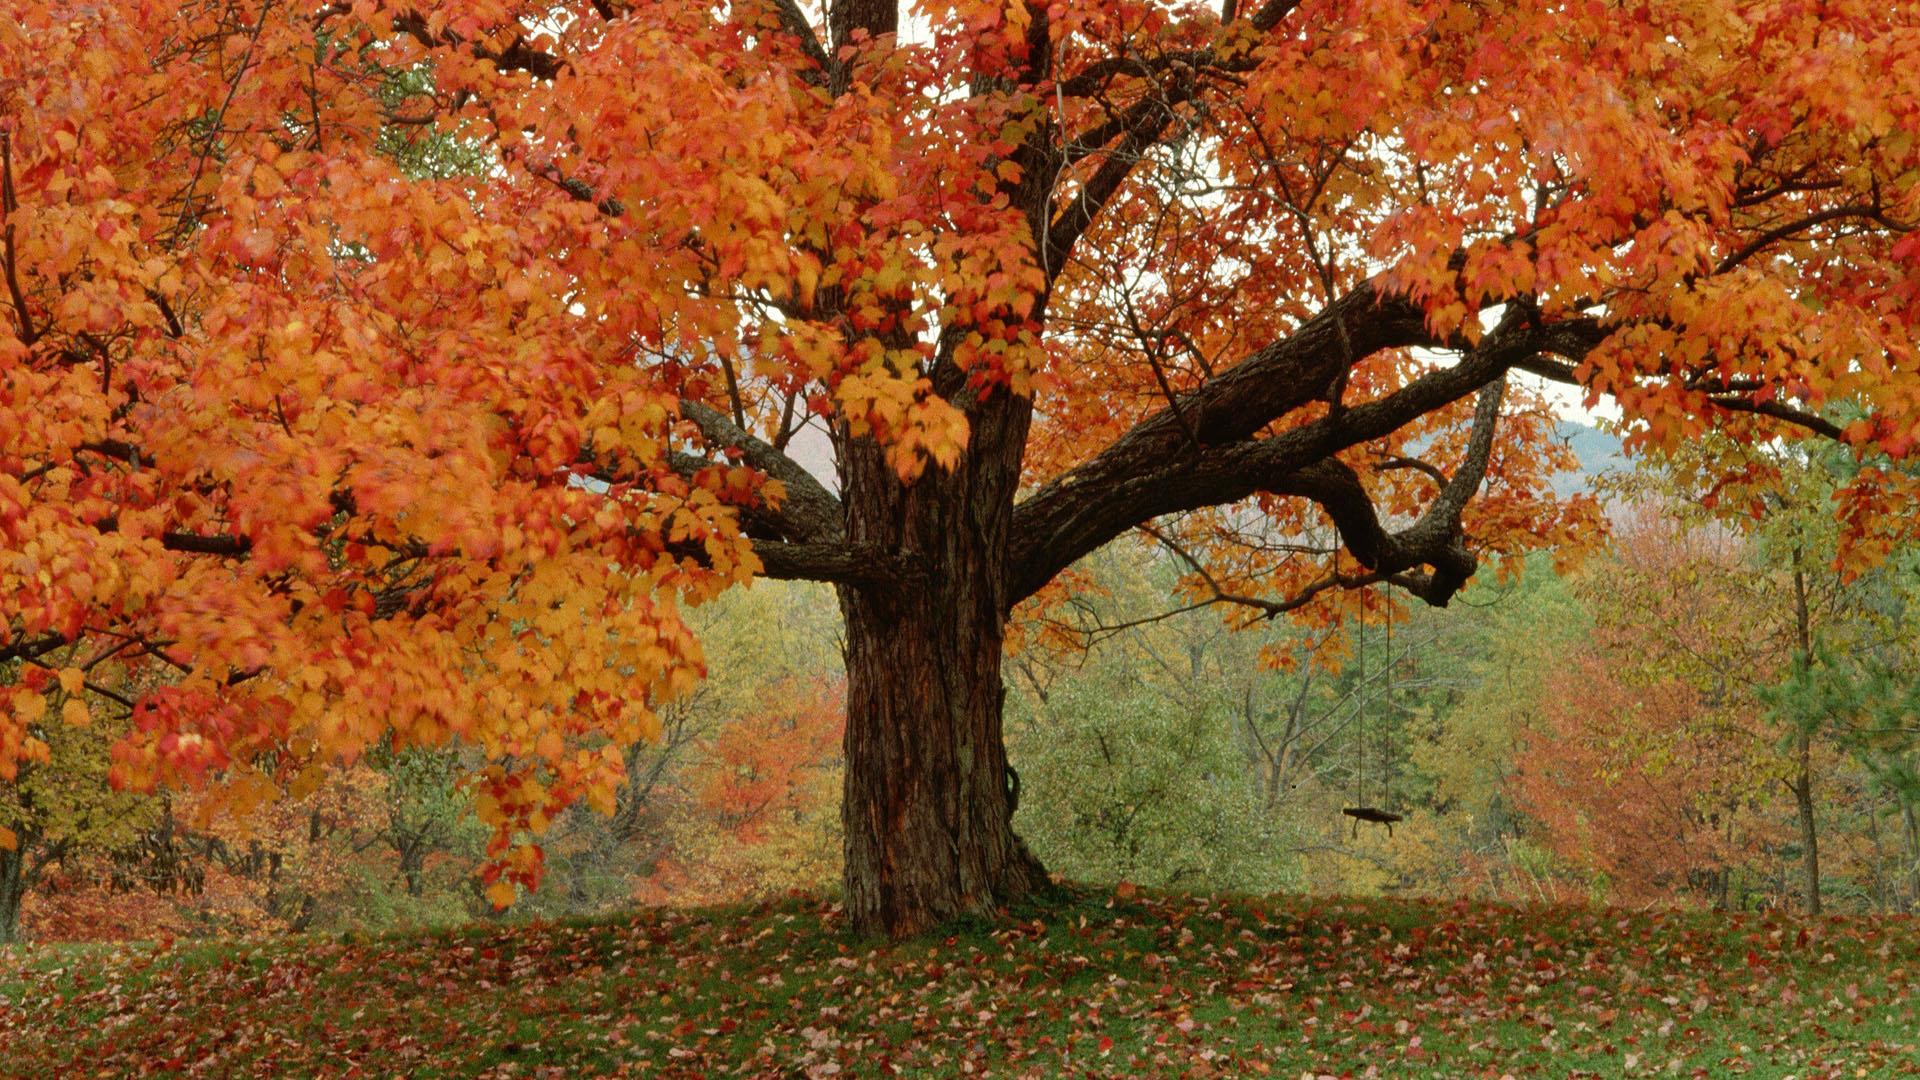 Autumn Trees wallpaper   751311 1920x1080